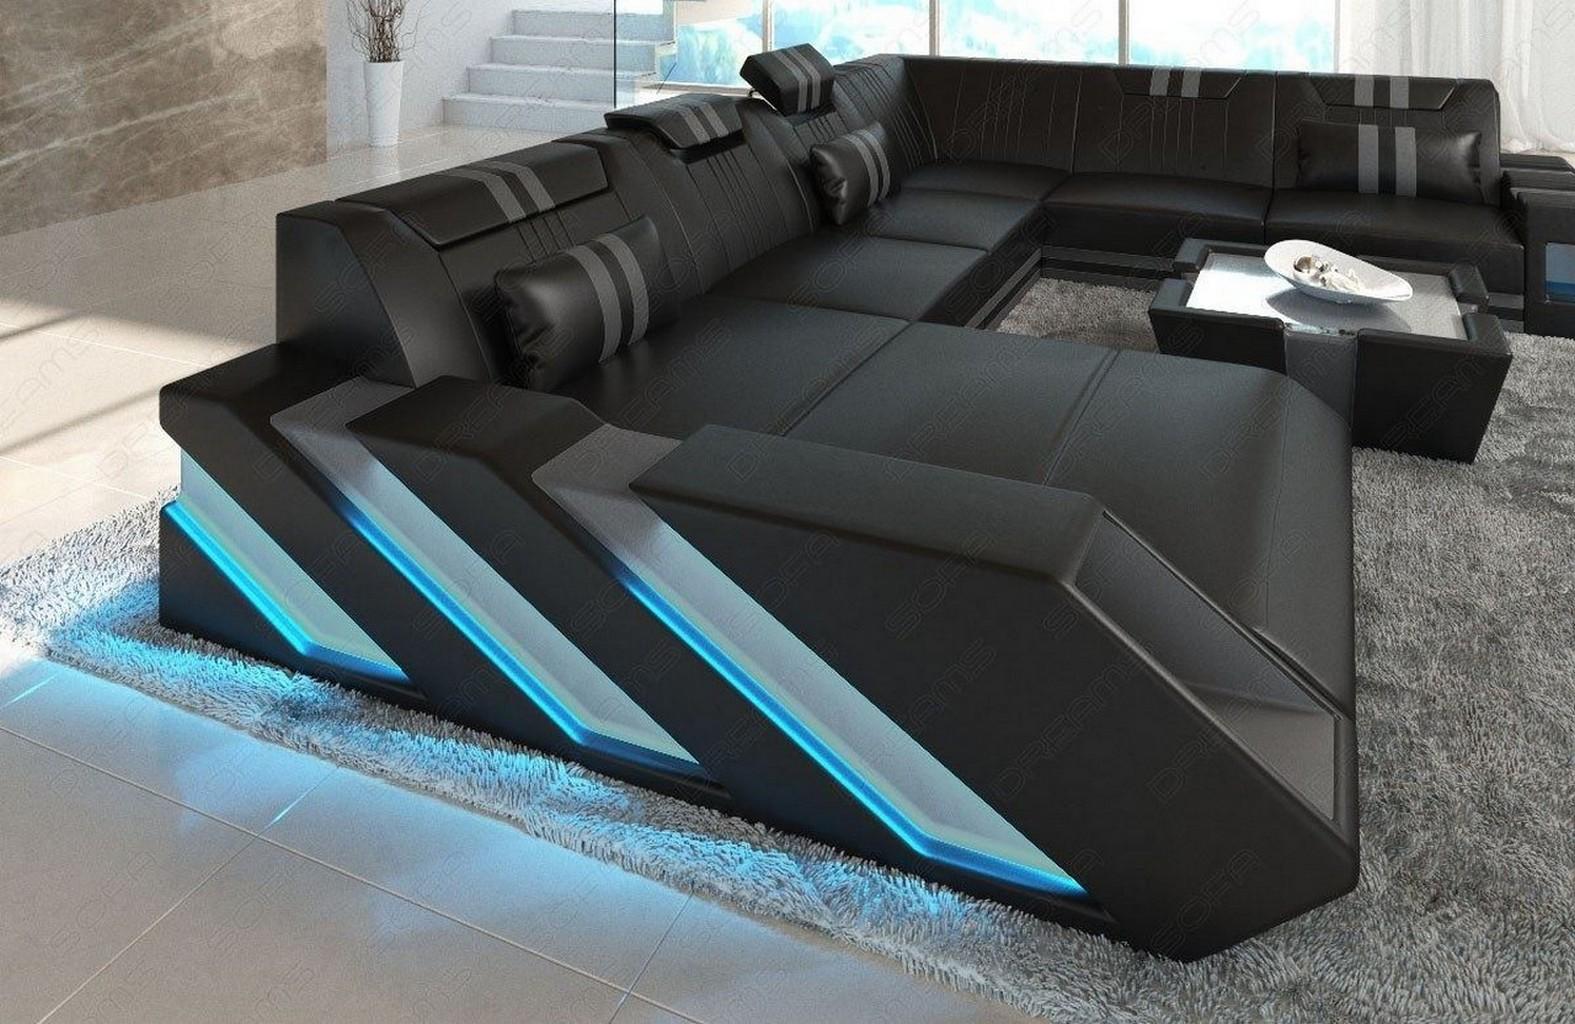 leather sofa interior design apollonia xll led usb. Black Bedroom Furniture Sets. Home Design Ideas